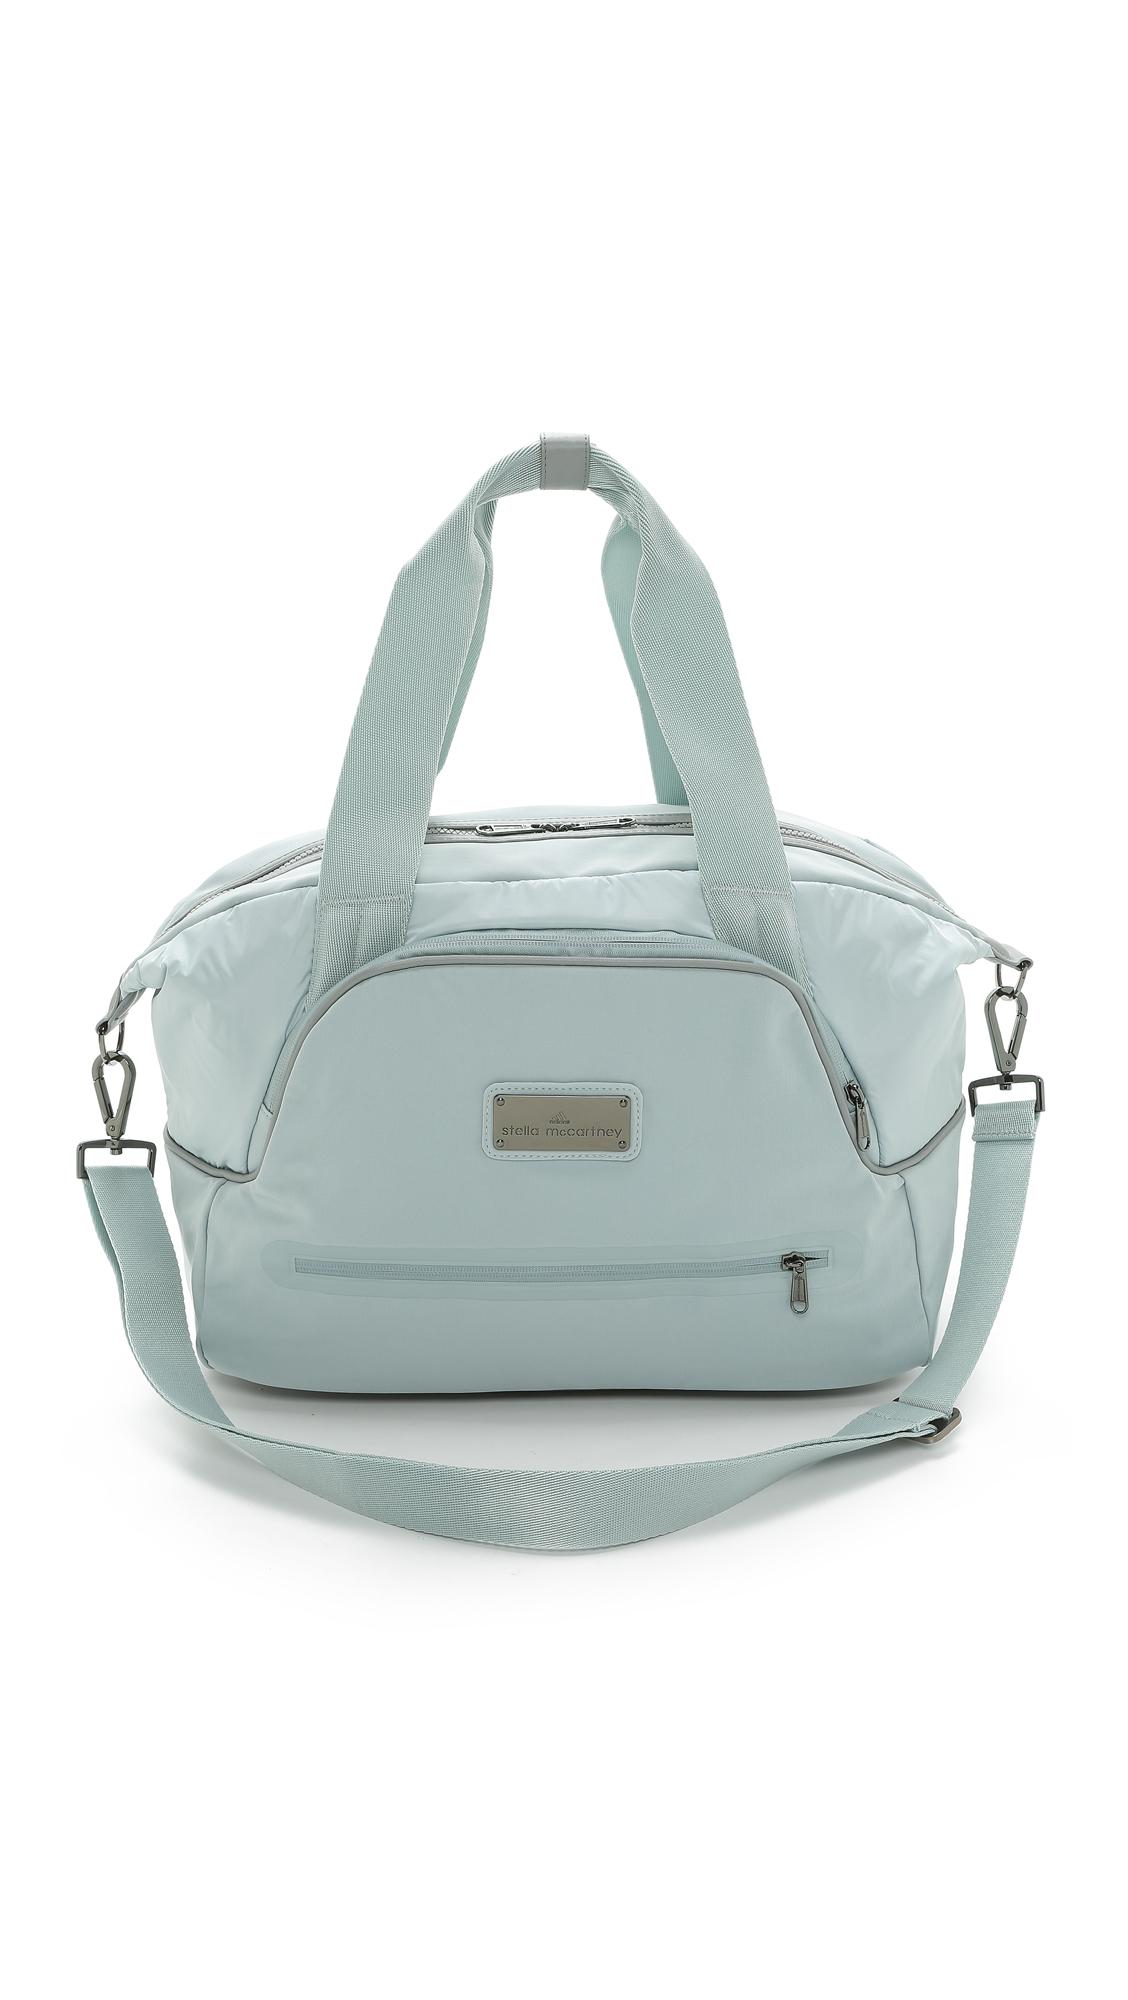 adidas by Stella McCartney Iconic Small Bag   SHOPBOP 5c4e99e517